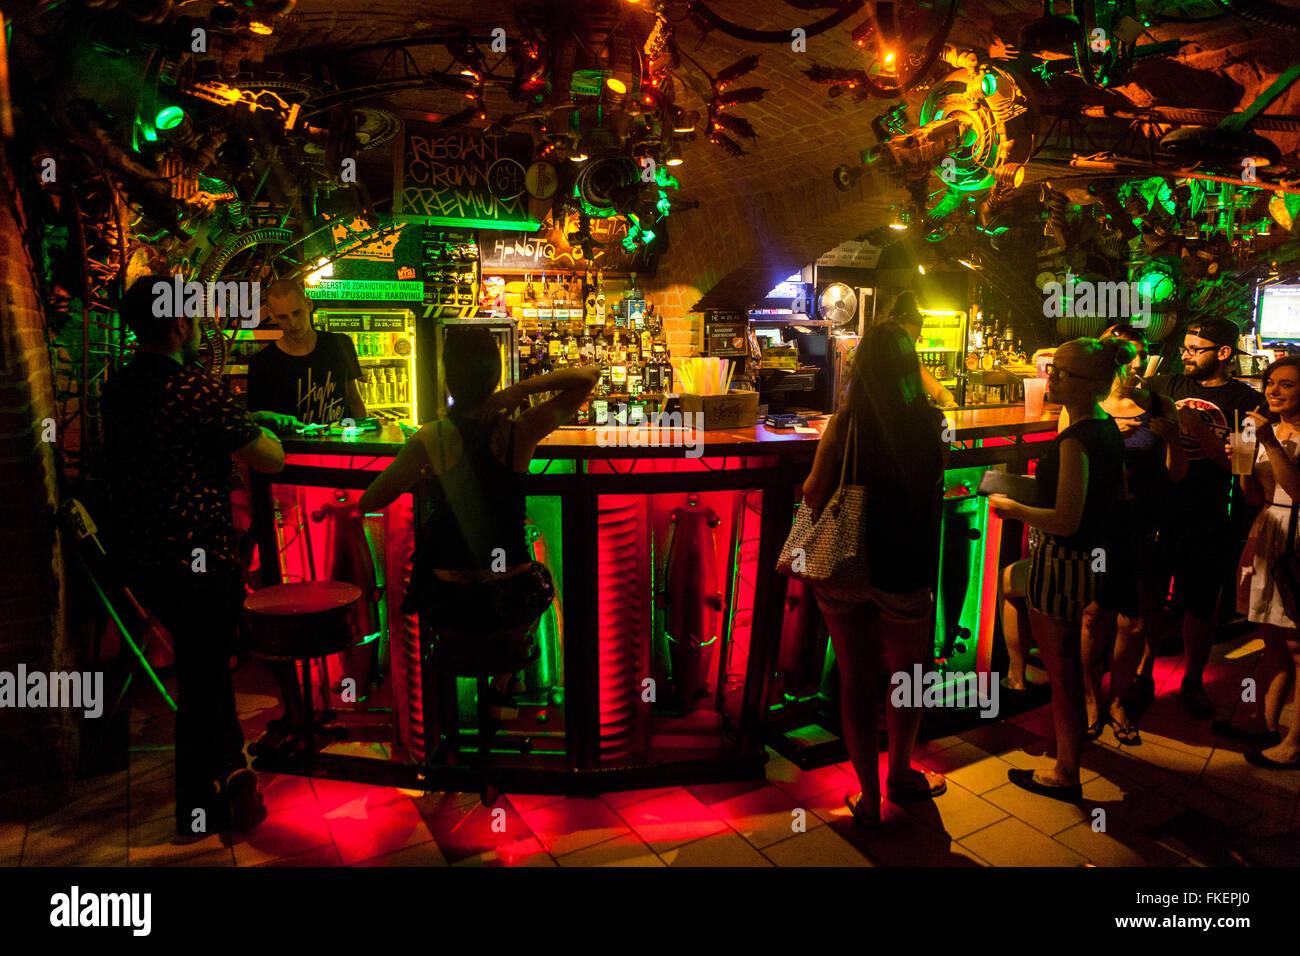 Cross Club Prag >> Cross Club, favorite music club, Nightlife, Prague Holesovice, Czech Stock Photo: 98055384 - Alamy